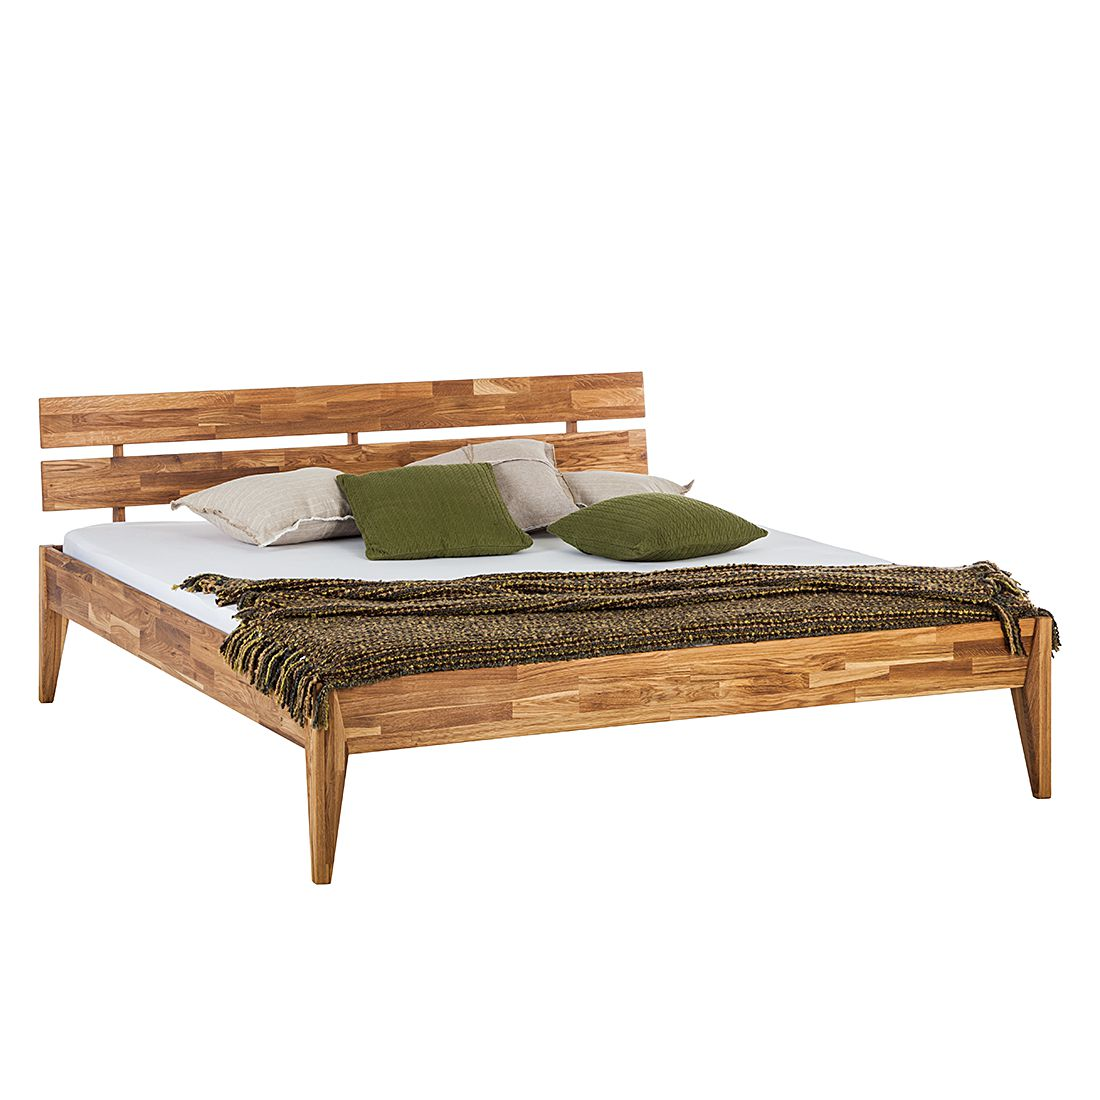 Lit en bois massif JillWOOD - 180 x 200cm - Chêne, Ars Natura